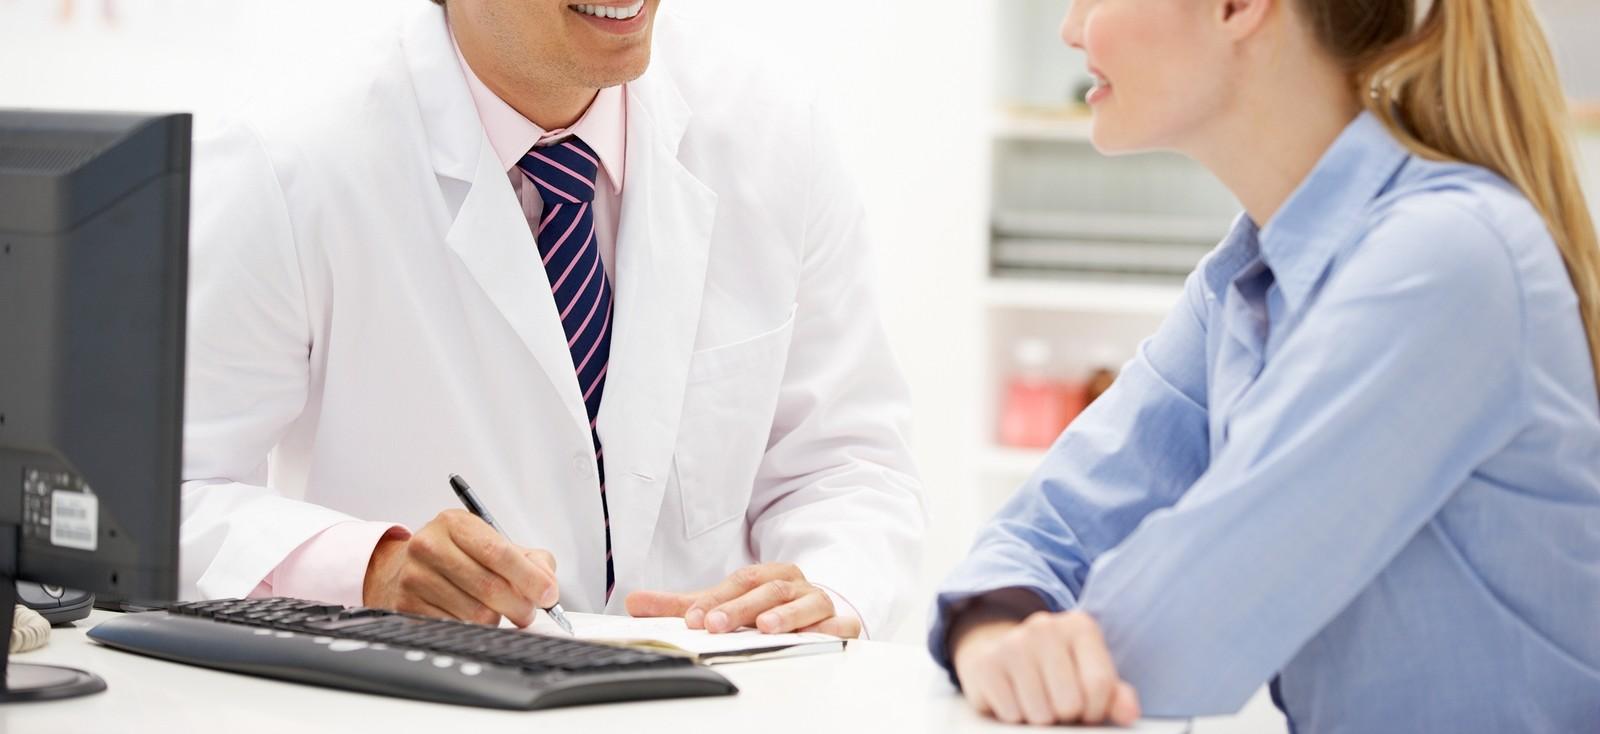 Blefaroplastia (Cirurgia de Pálpebras): opções de procedimento - Cirurgia Plástica Curitiba - Clínica CMP